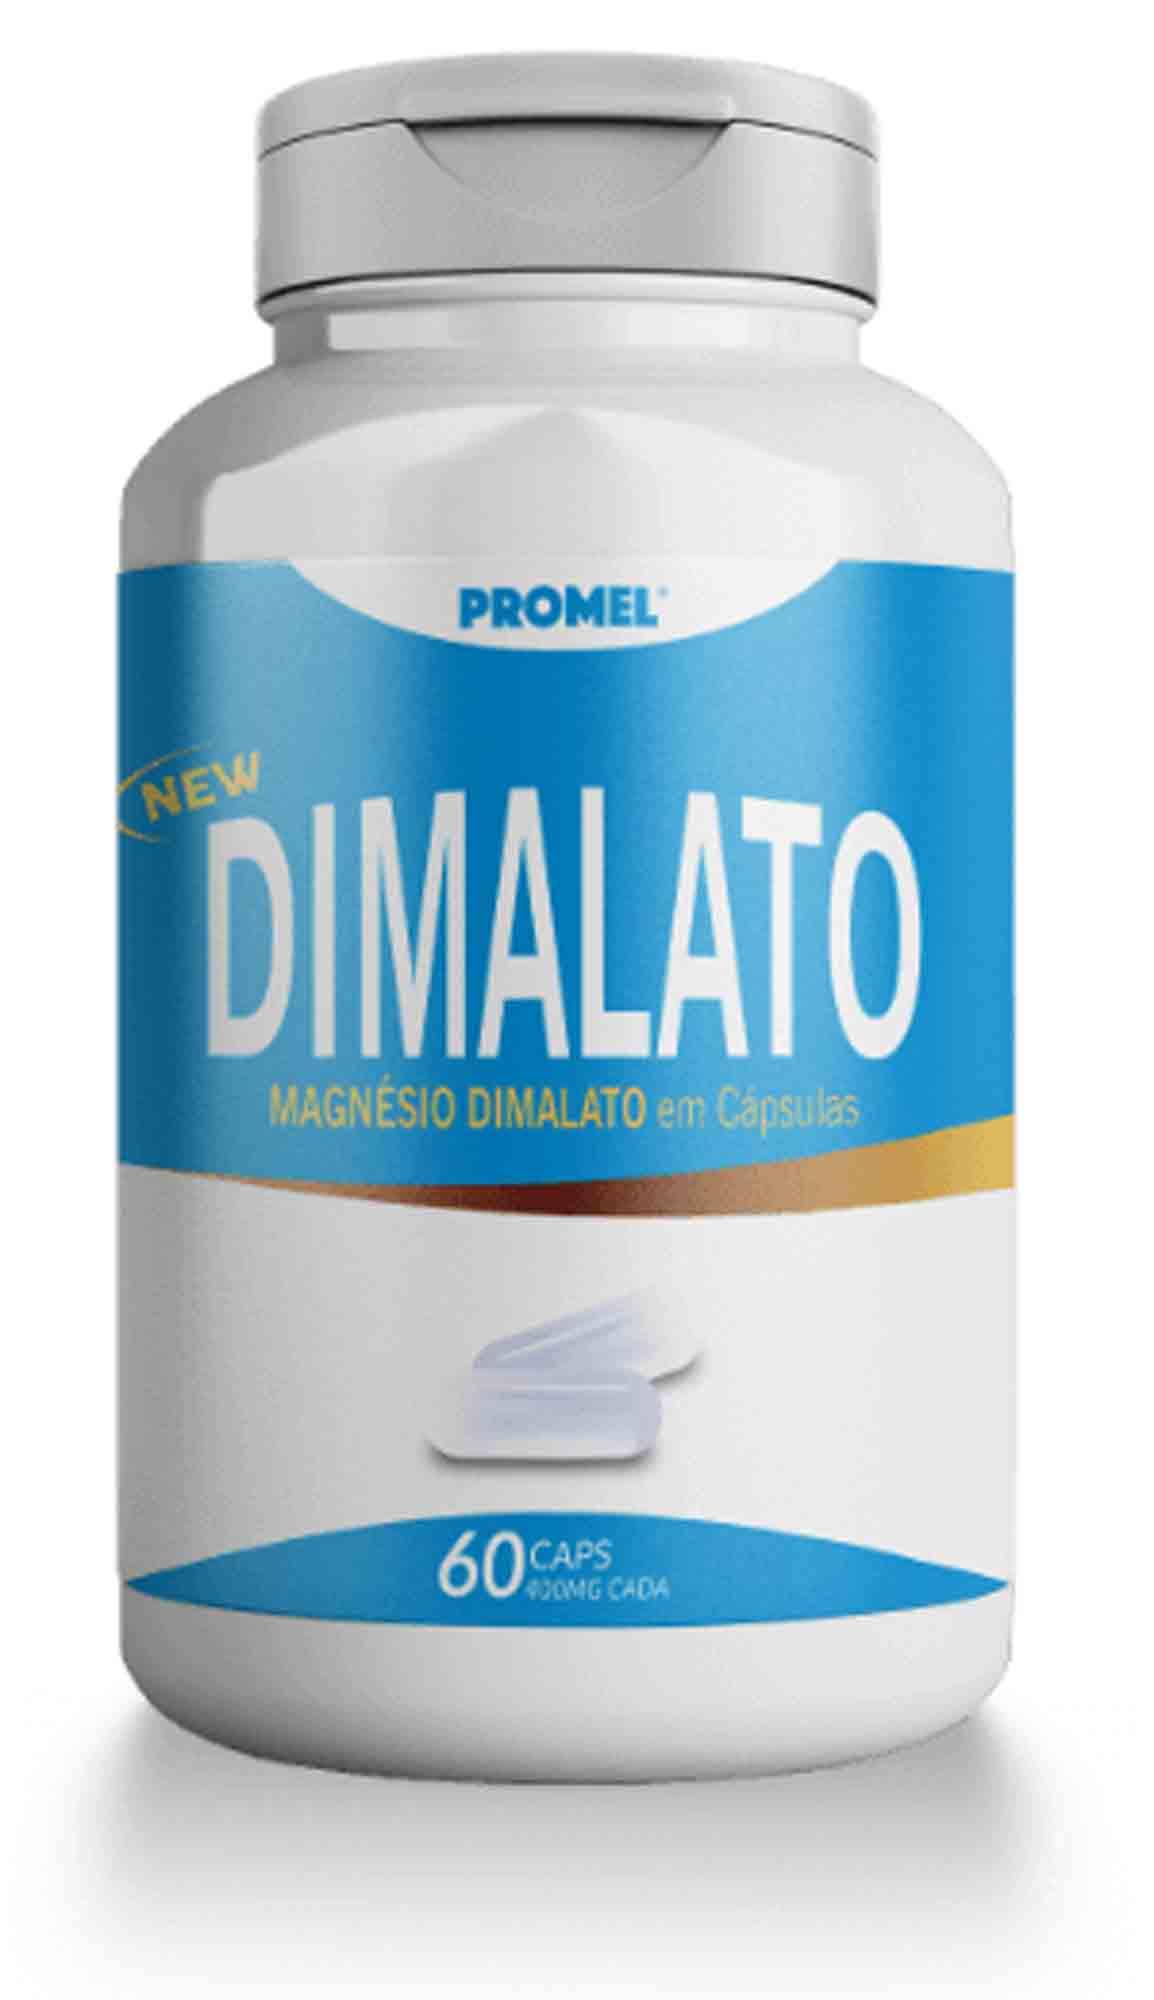 Magnésio Dimalato 60 Caps 400mg Promel